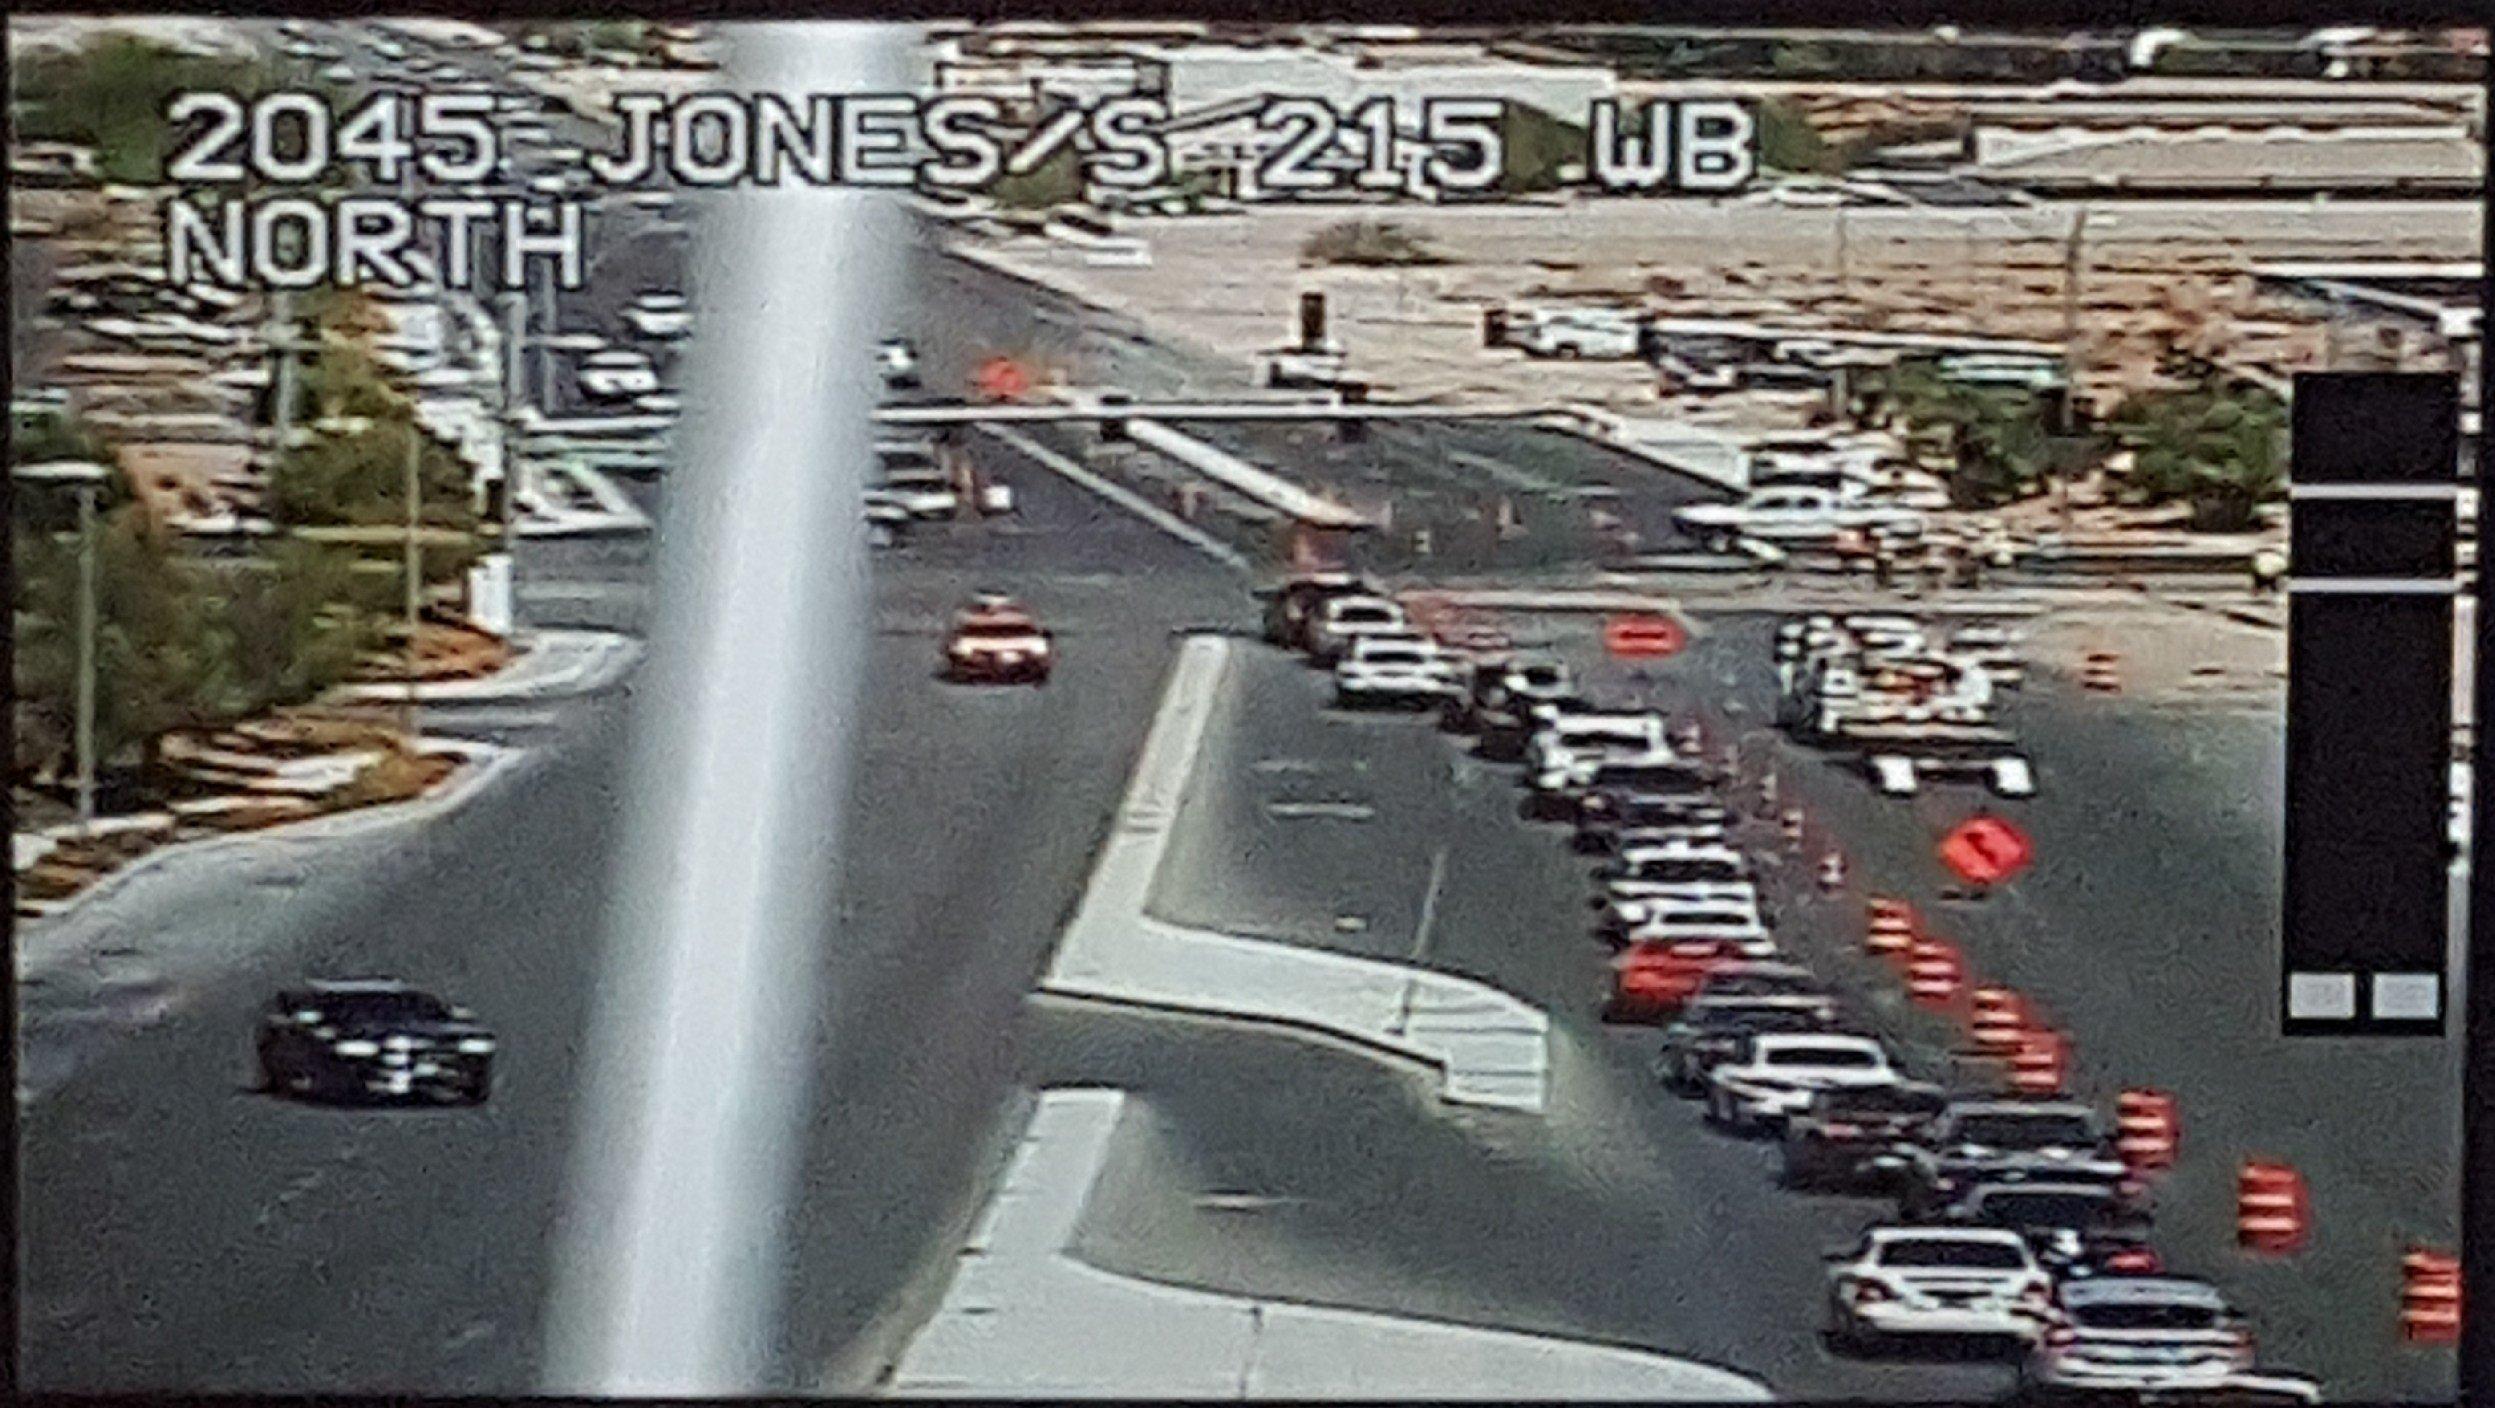 Gas leak closes lanes of Jones Blvd. at I-215   Photo: LVACS